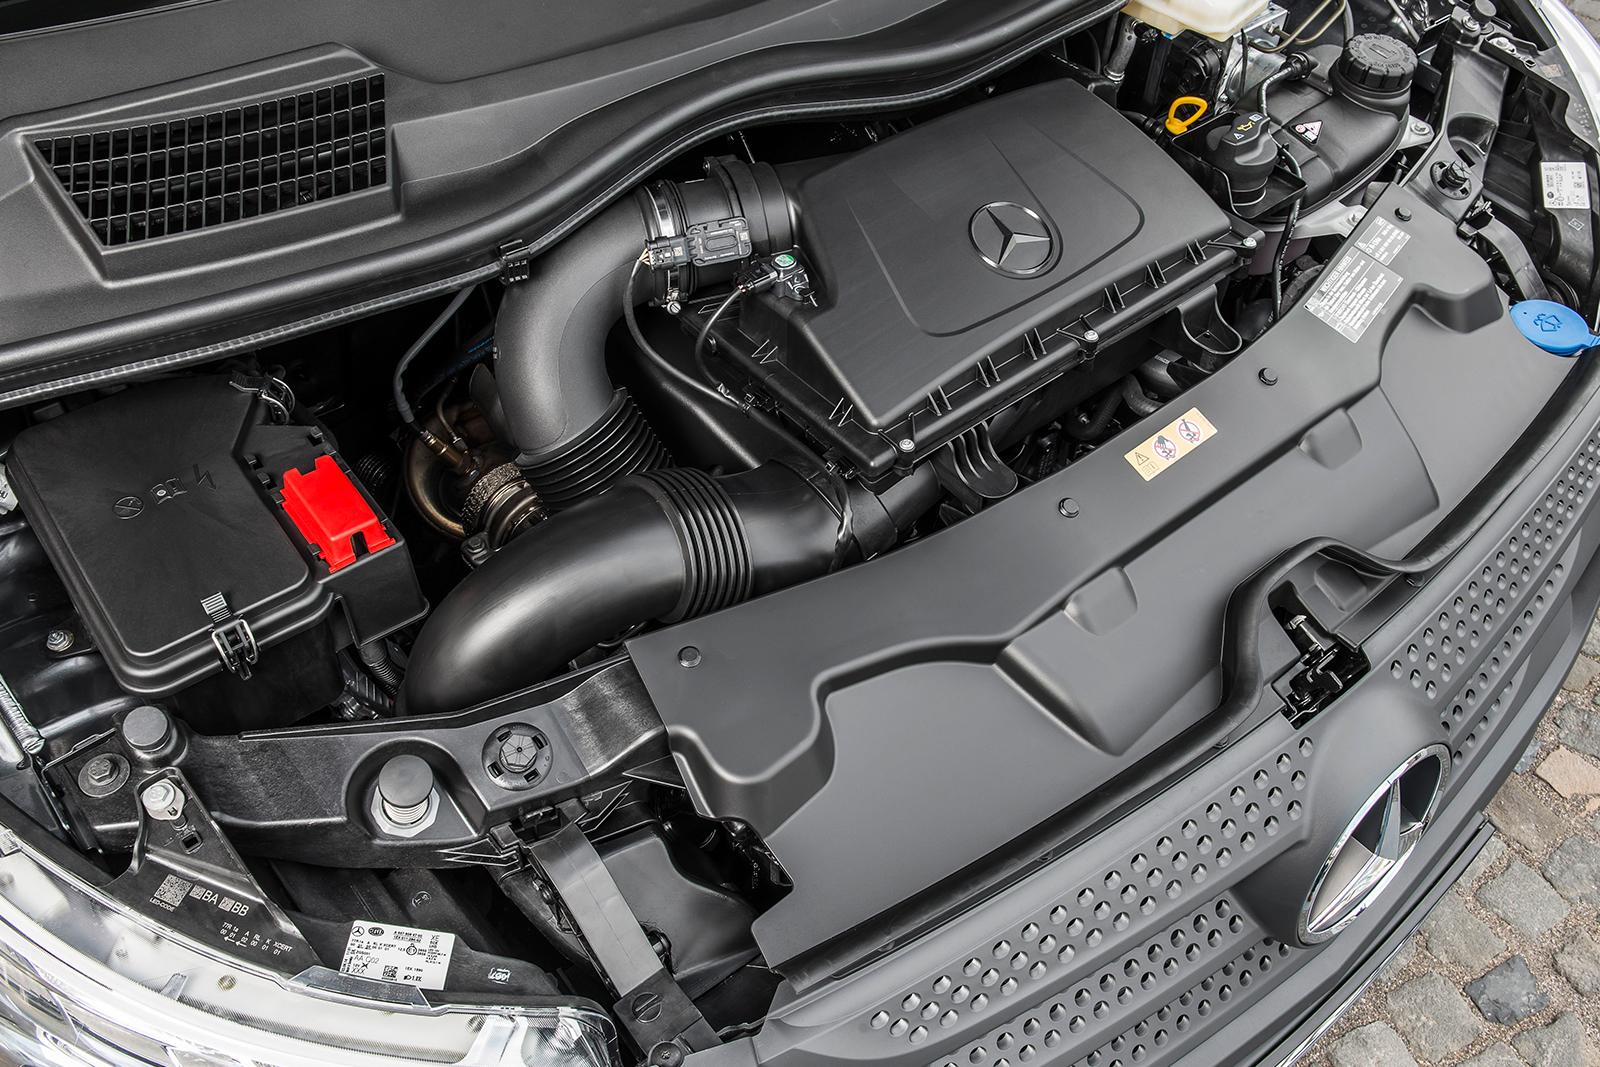 Mercedes-Bnz-Vito-Mixto-Motor-Motorraum-Antrieb